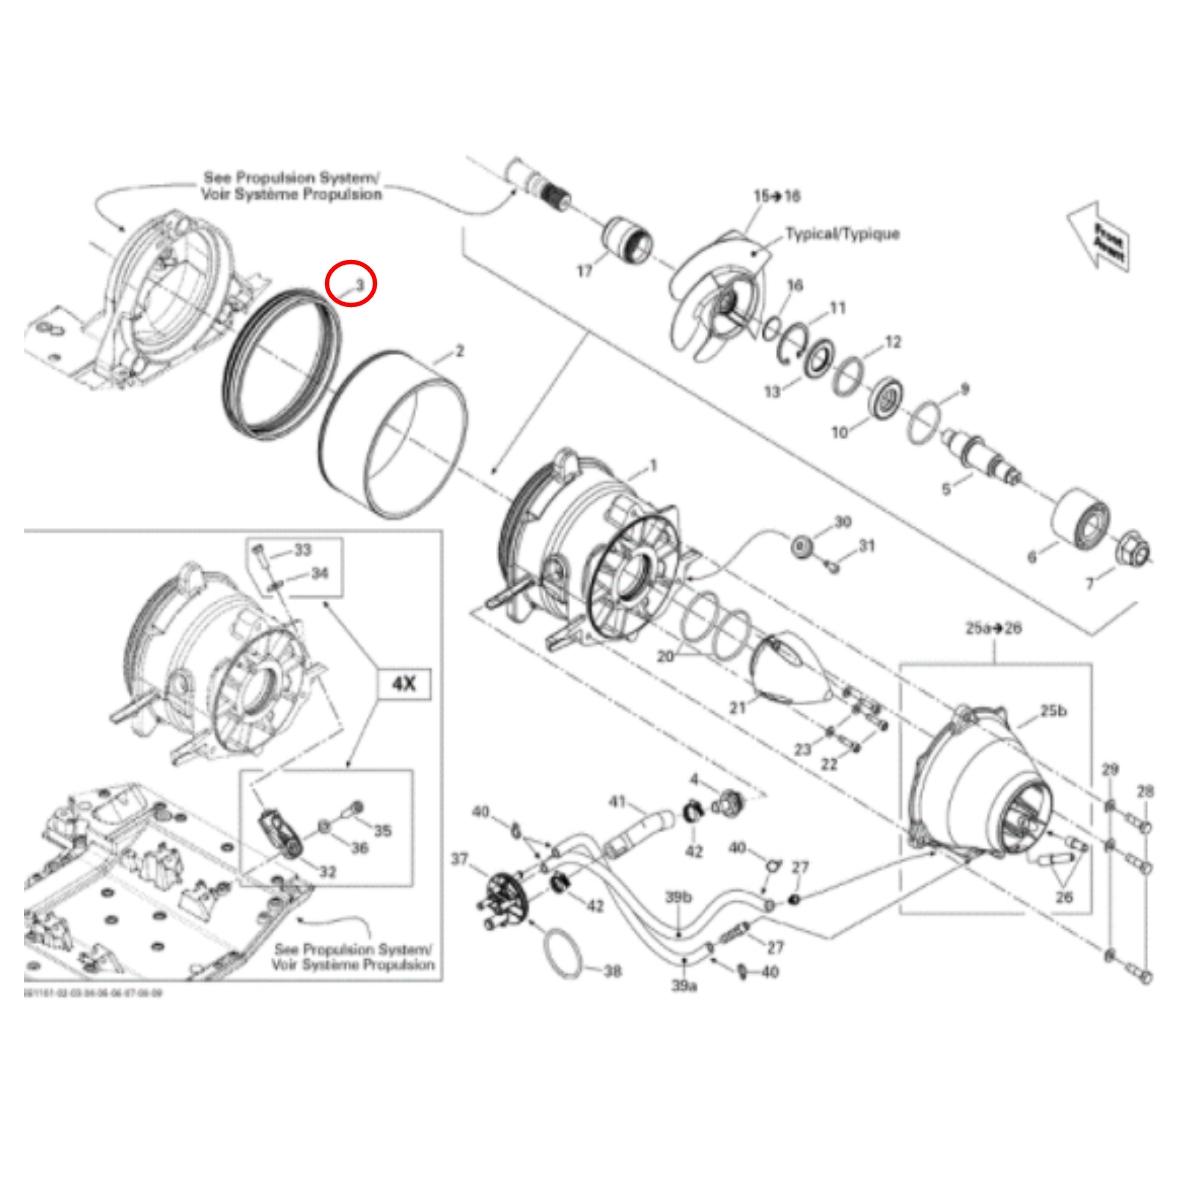 Anel Vedação Turbina Jet Ski Sea Doo RXT IS  - Radical Peças - Peças para Jet Ski